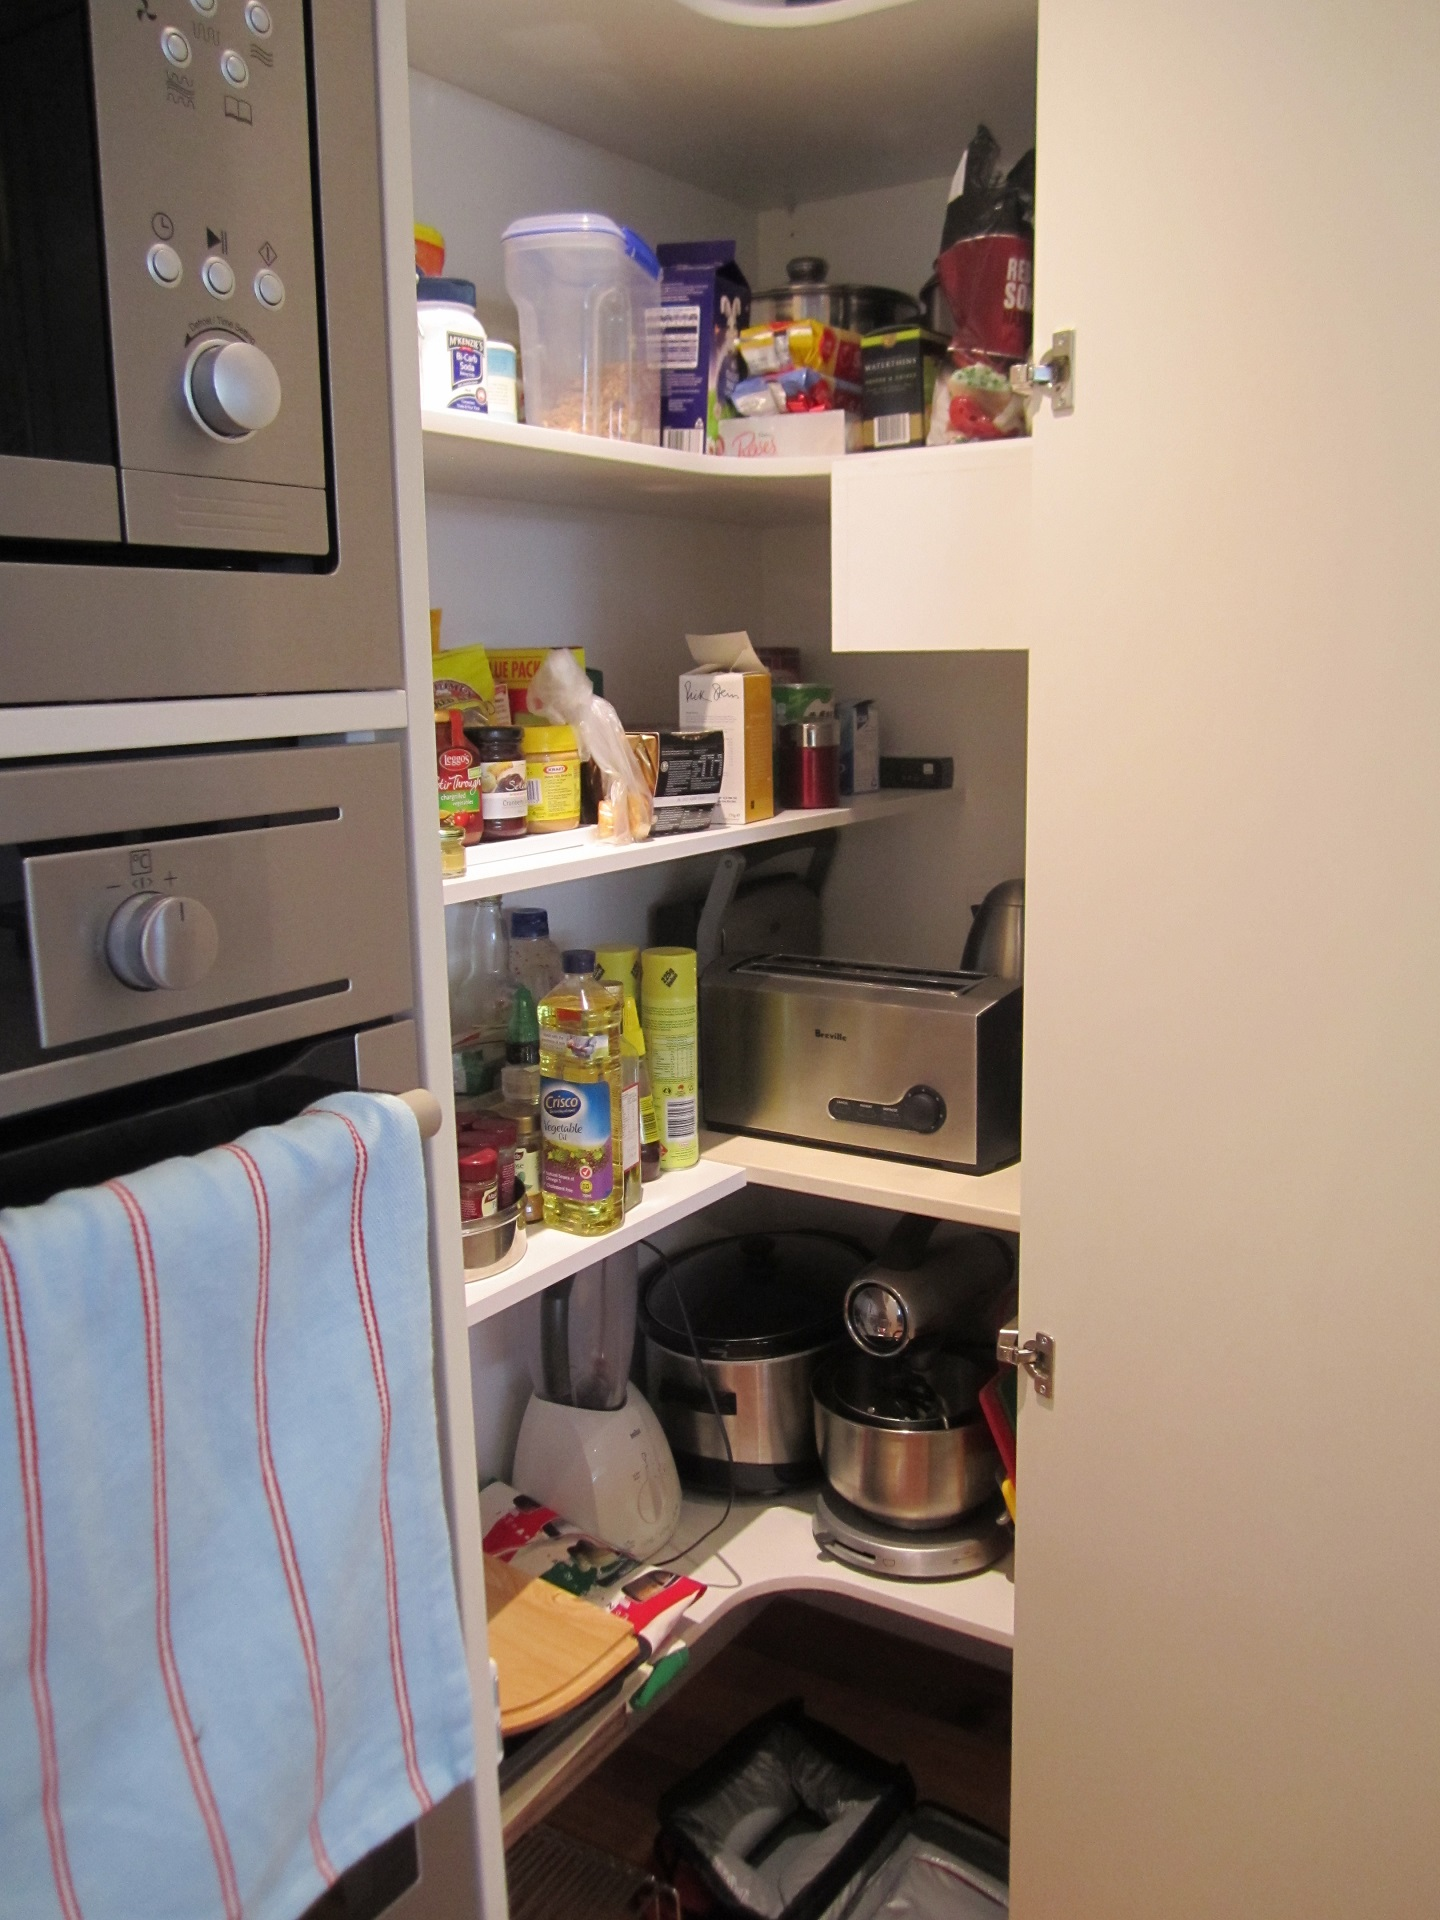 Brisbane Kitchen Design Sydney St Camp Hill  Traditional Kitchen Renovation Corner Pantry Internal(5)